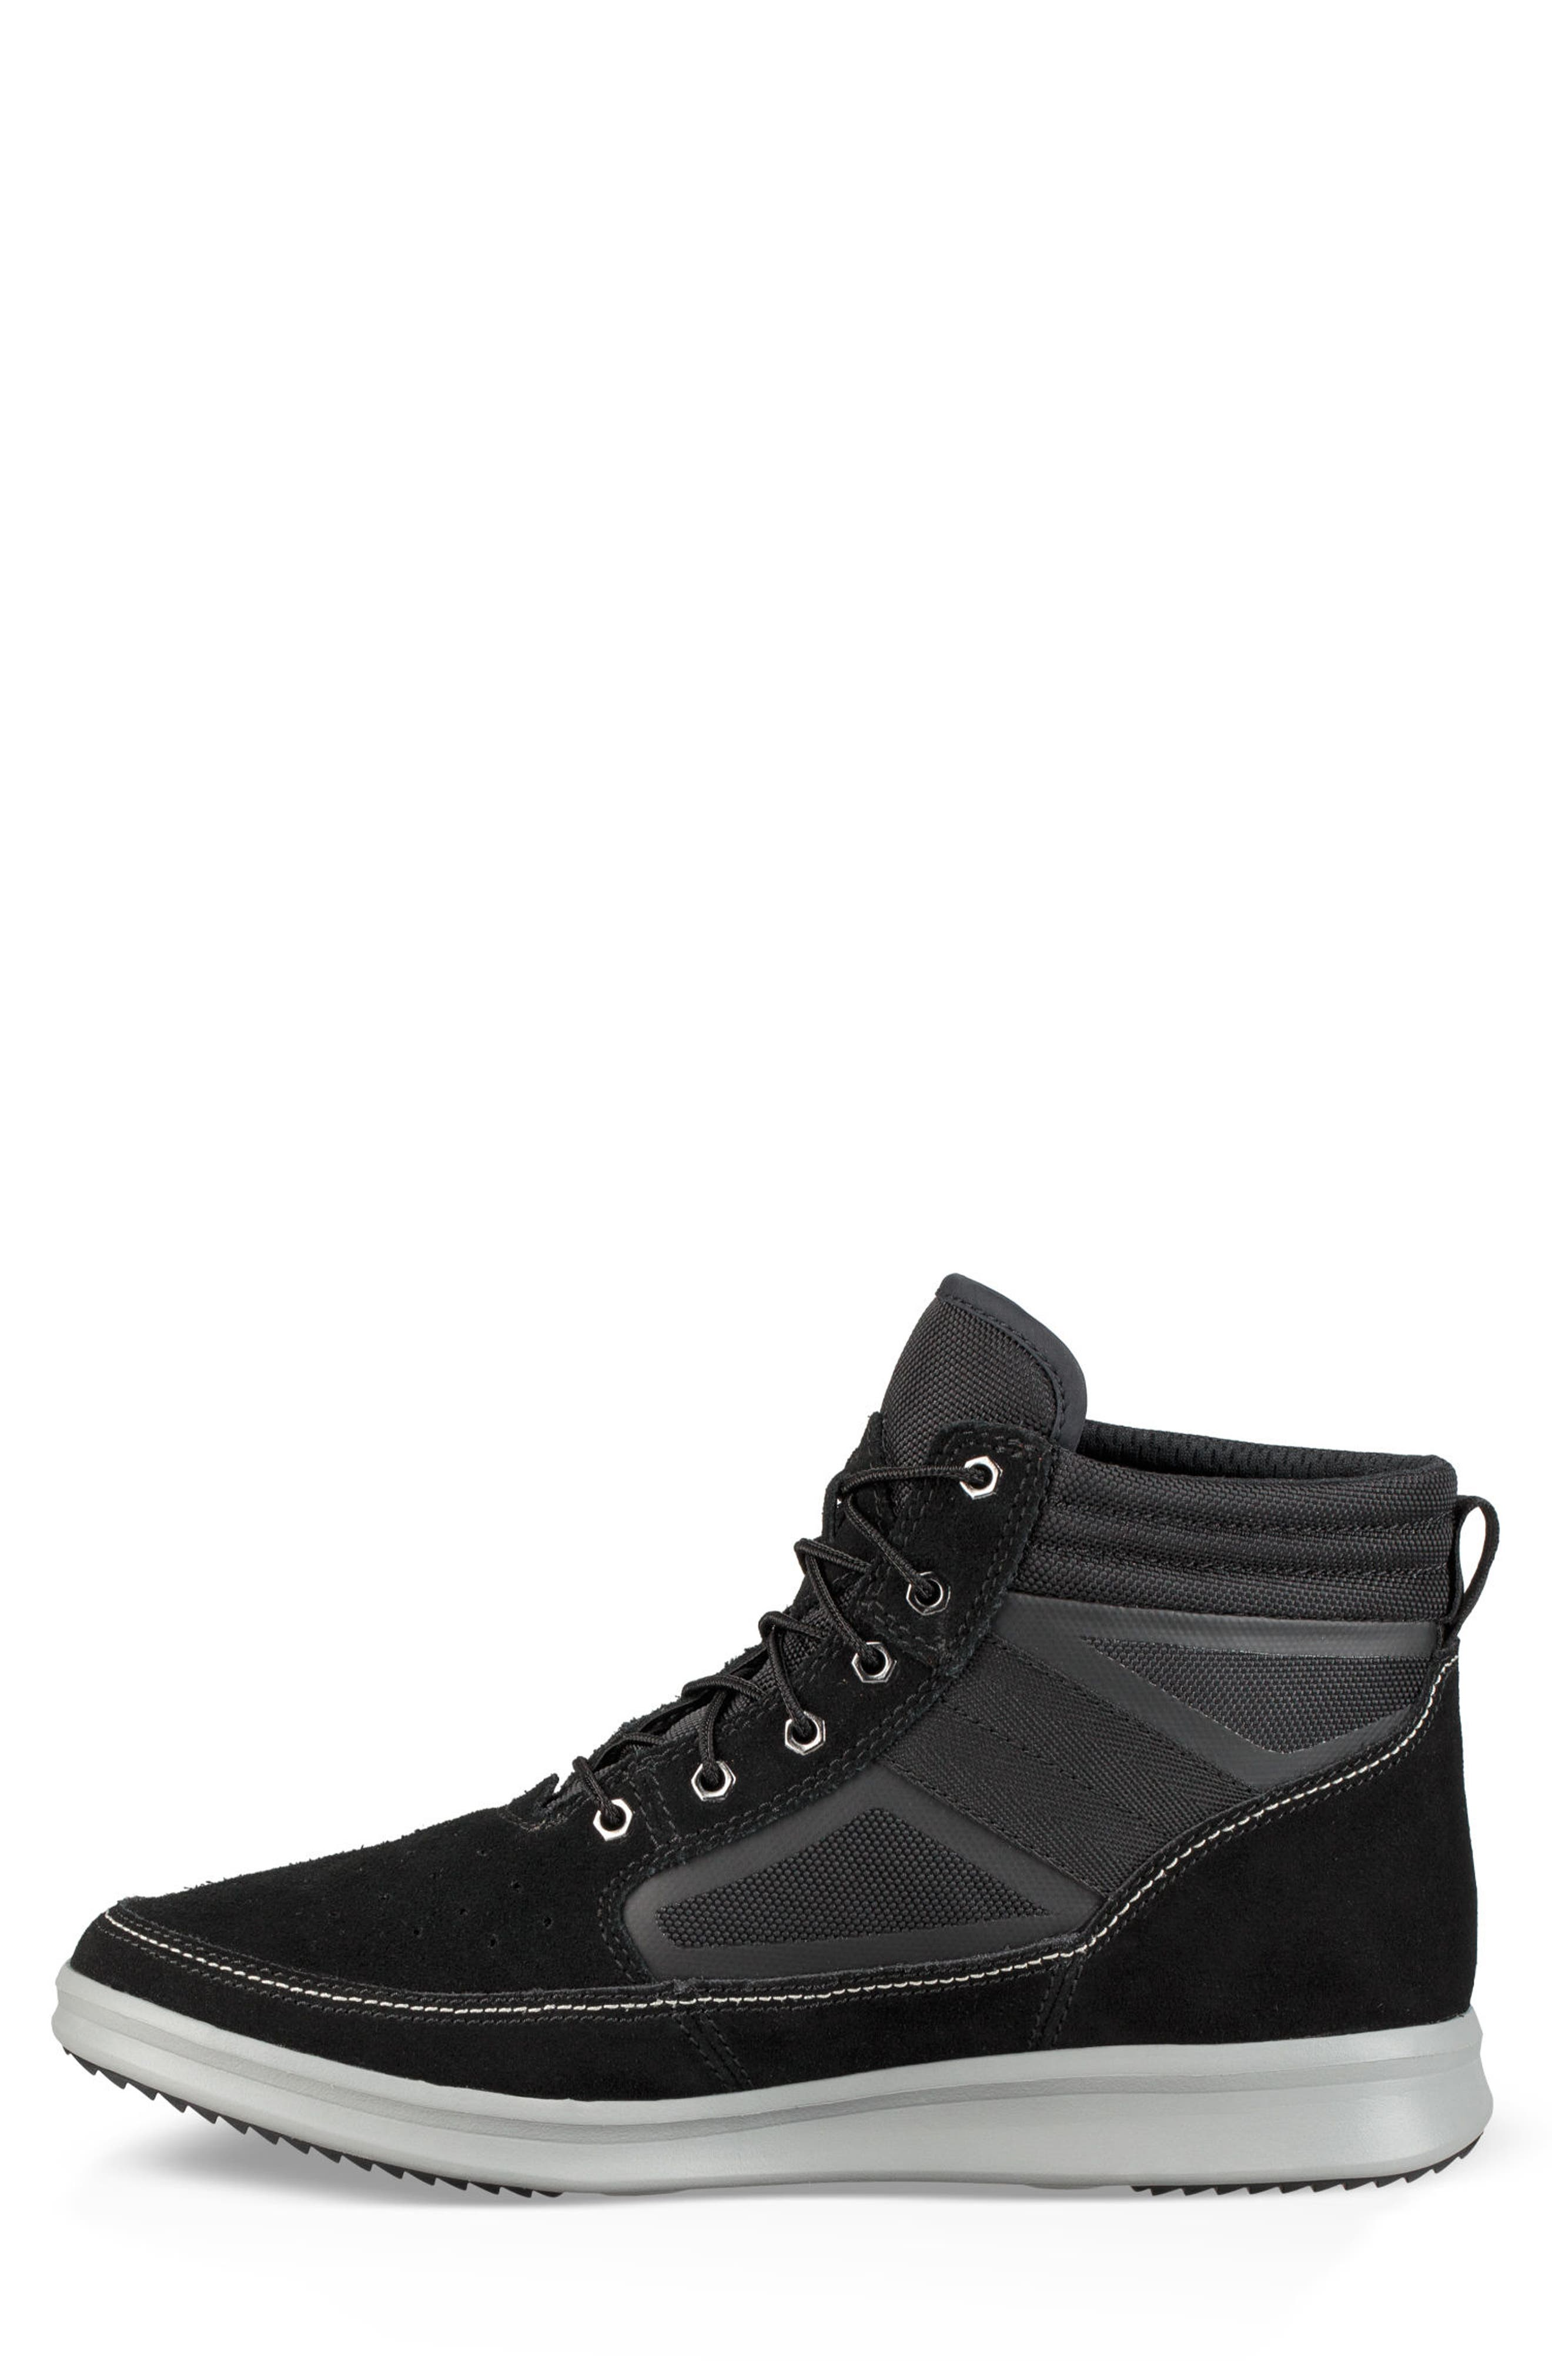 Hepner Moc Toe Boot,                             Alternate thumbnail 3, color,                             001